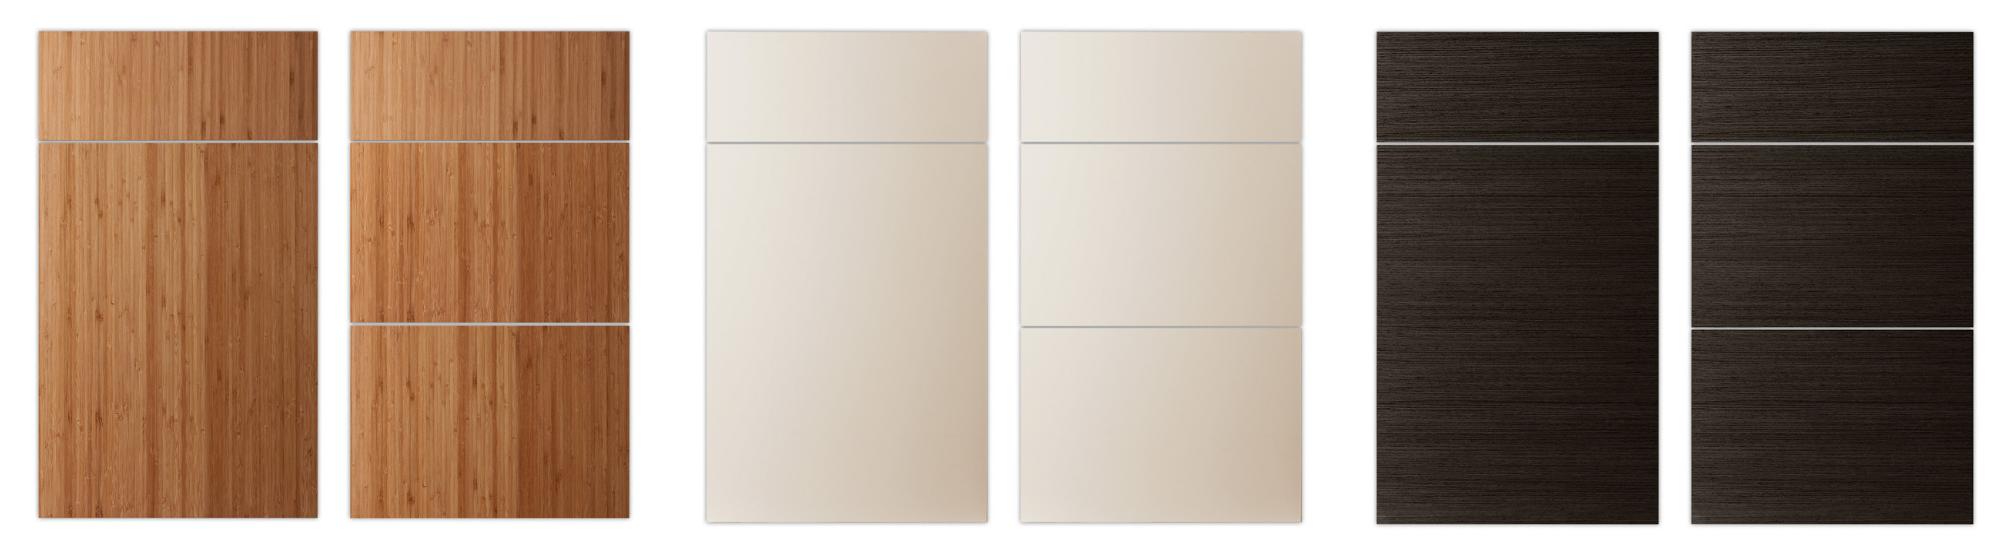 Slab cabinetdoor styles